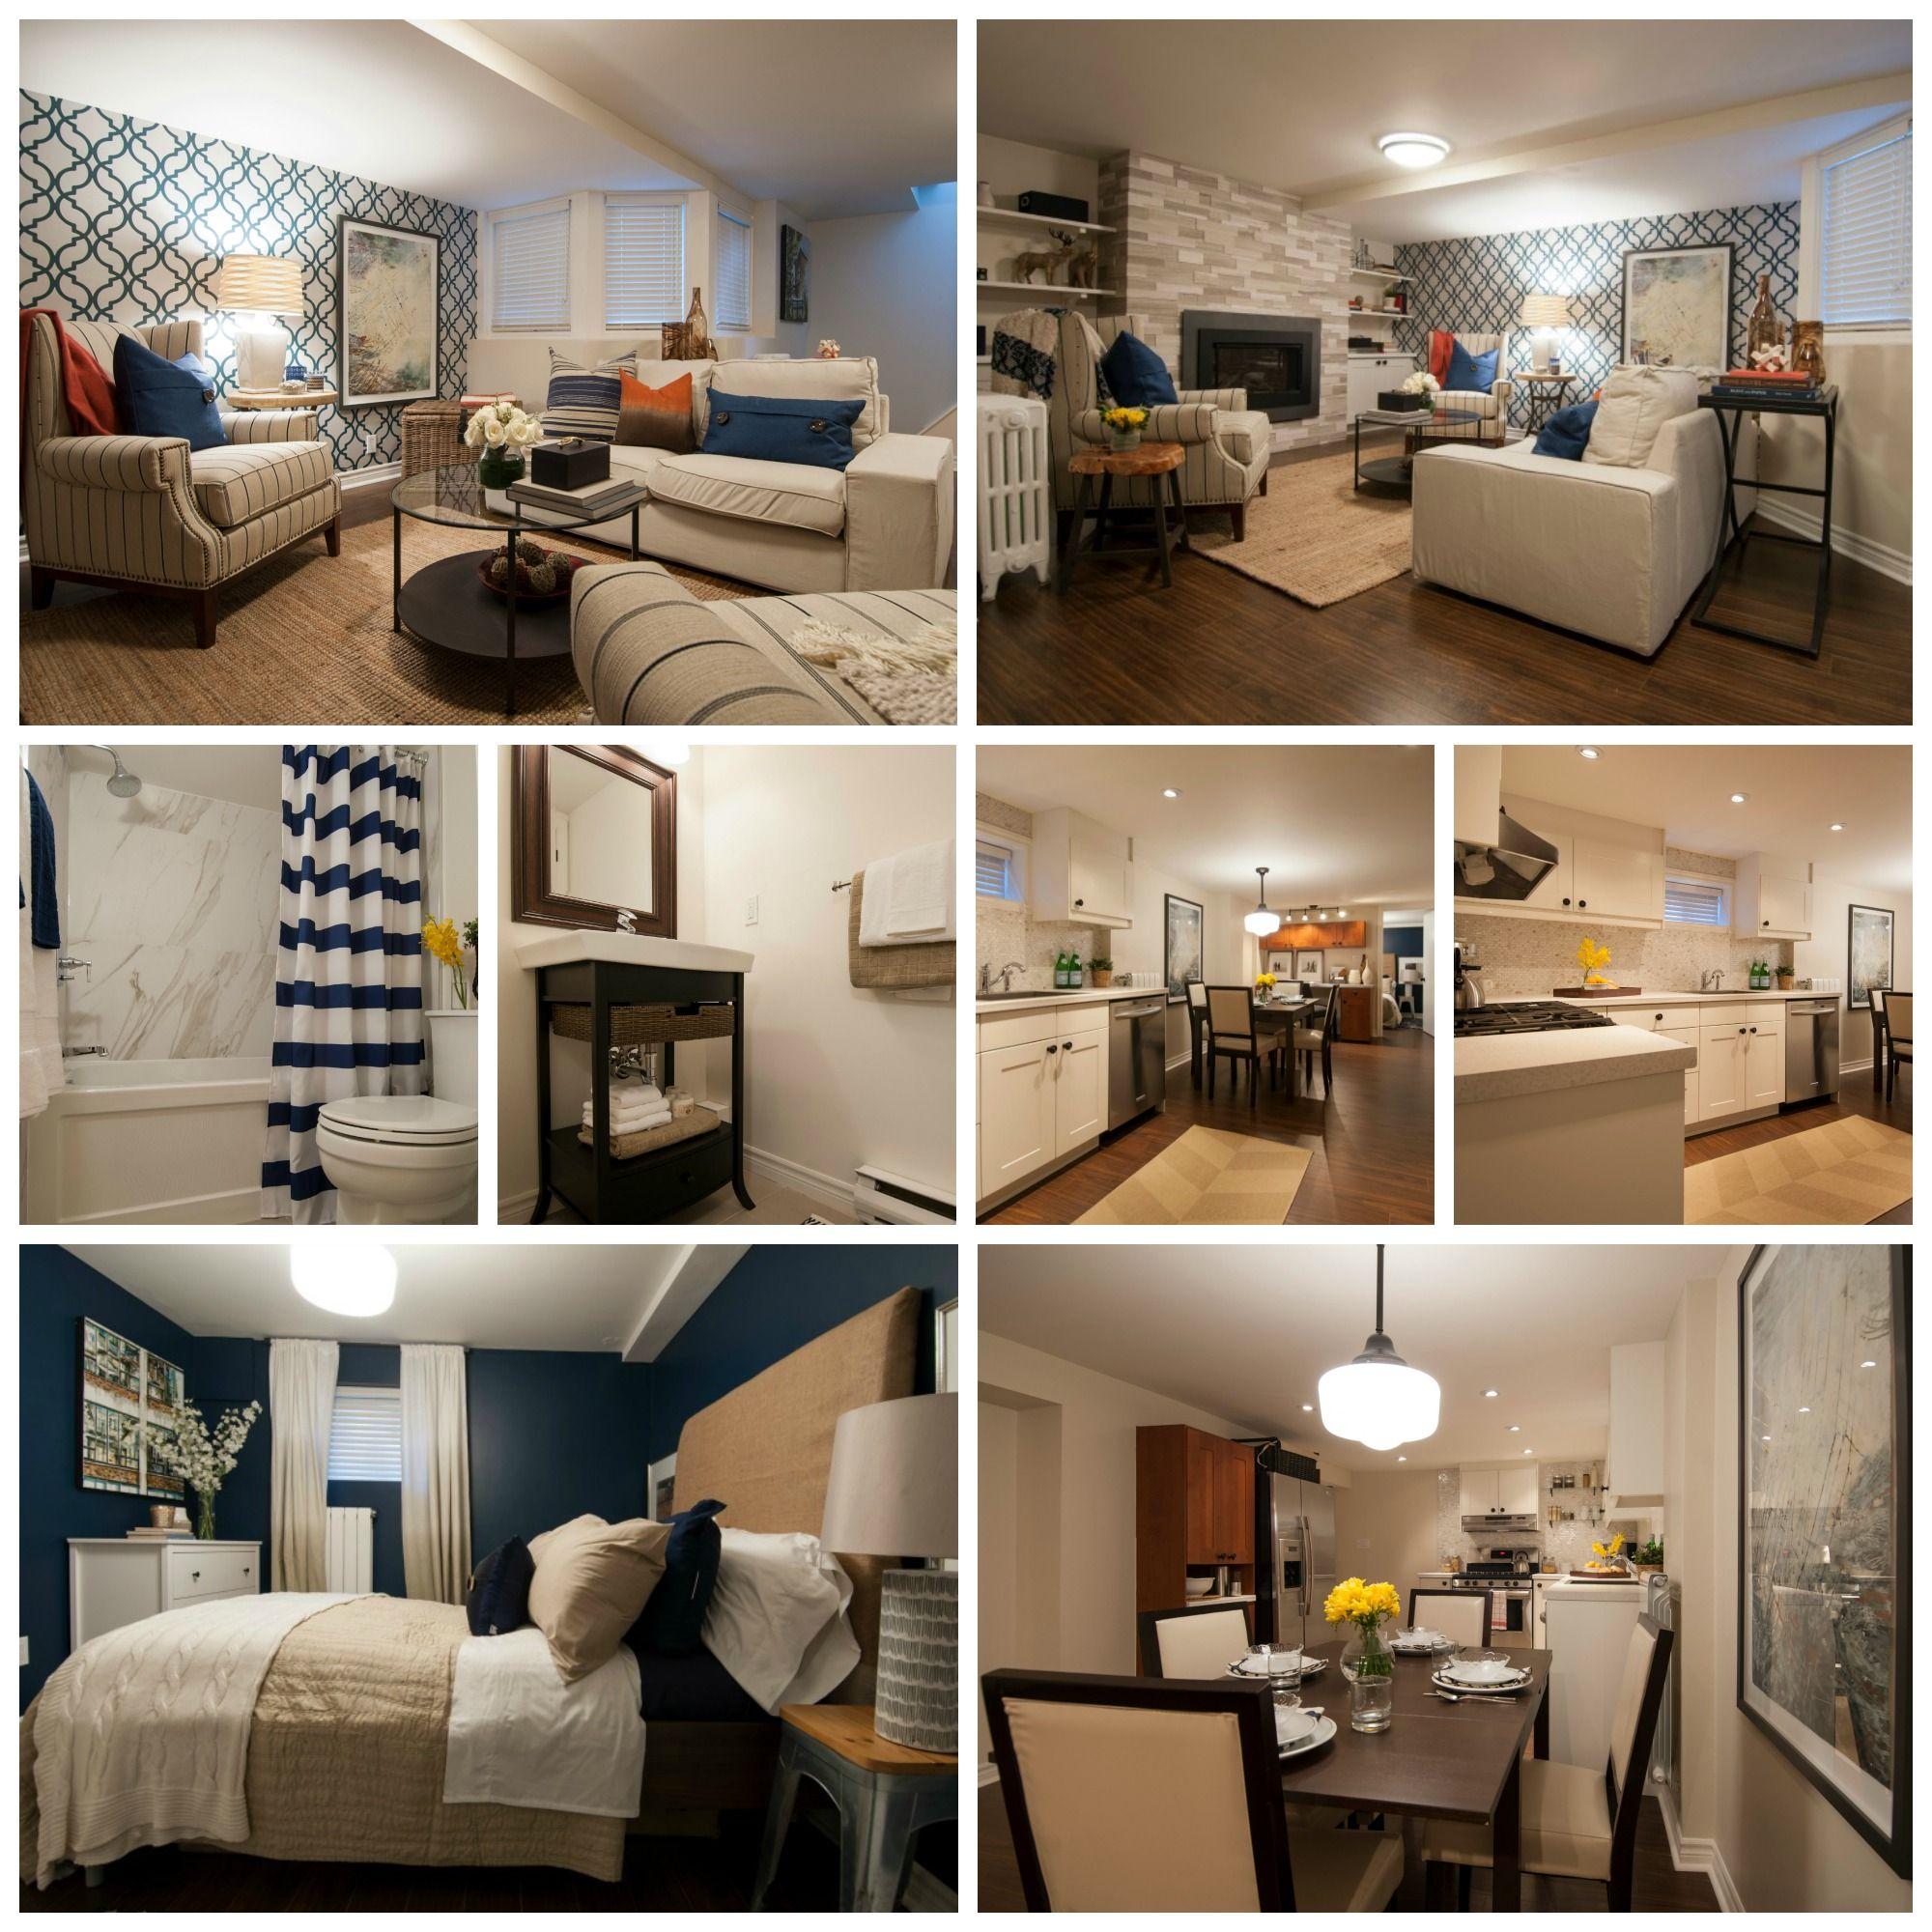 Income Property | Small basement apartments, Basement ...